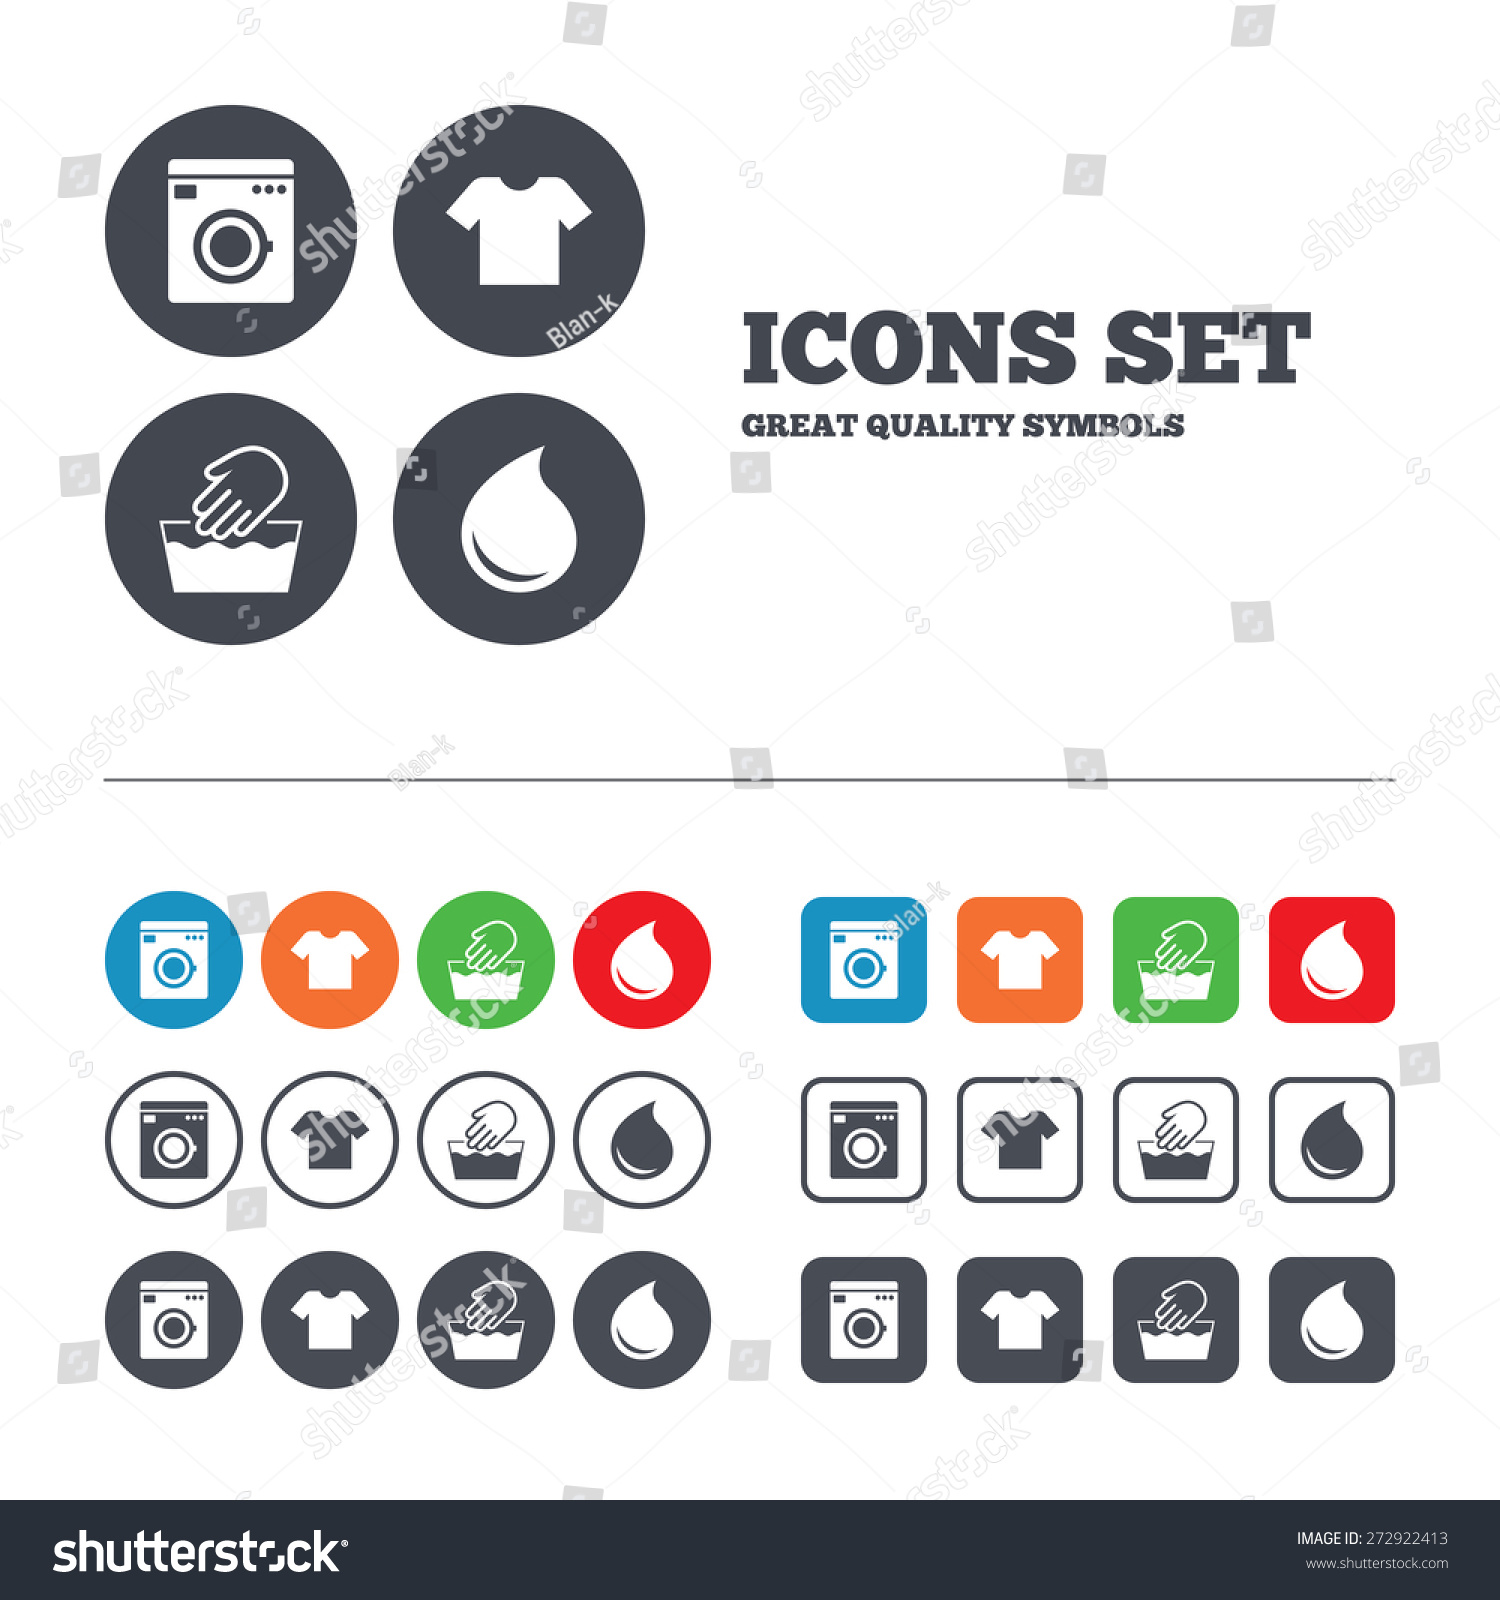 Clothes Wash Signs: Wash Machine Icon Hand Wash Tshirt Stock Vector 272922413